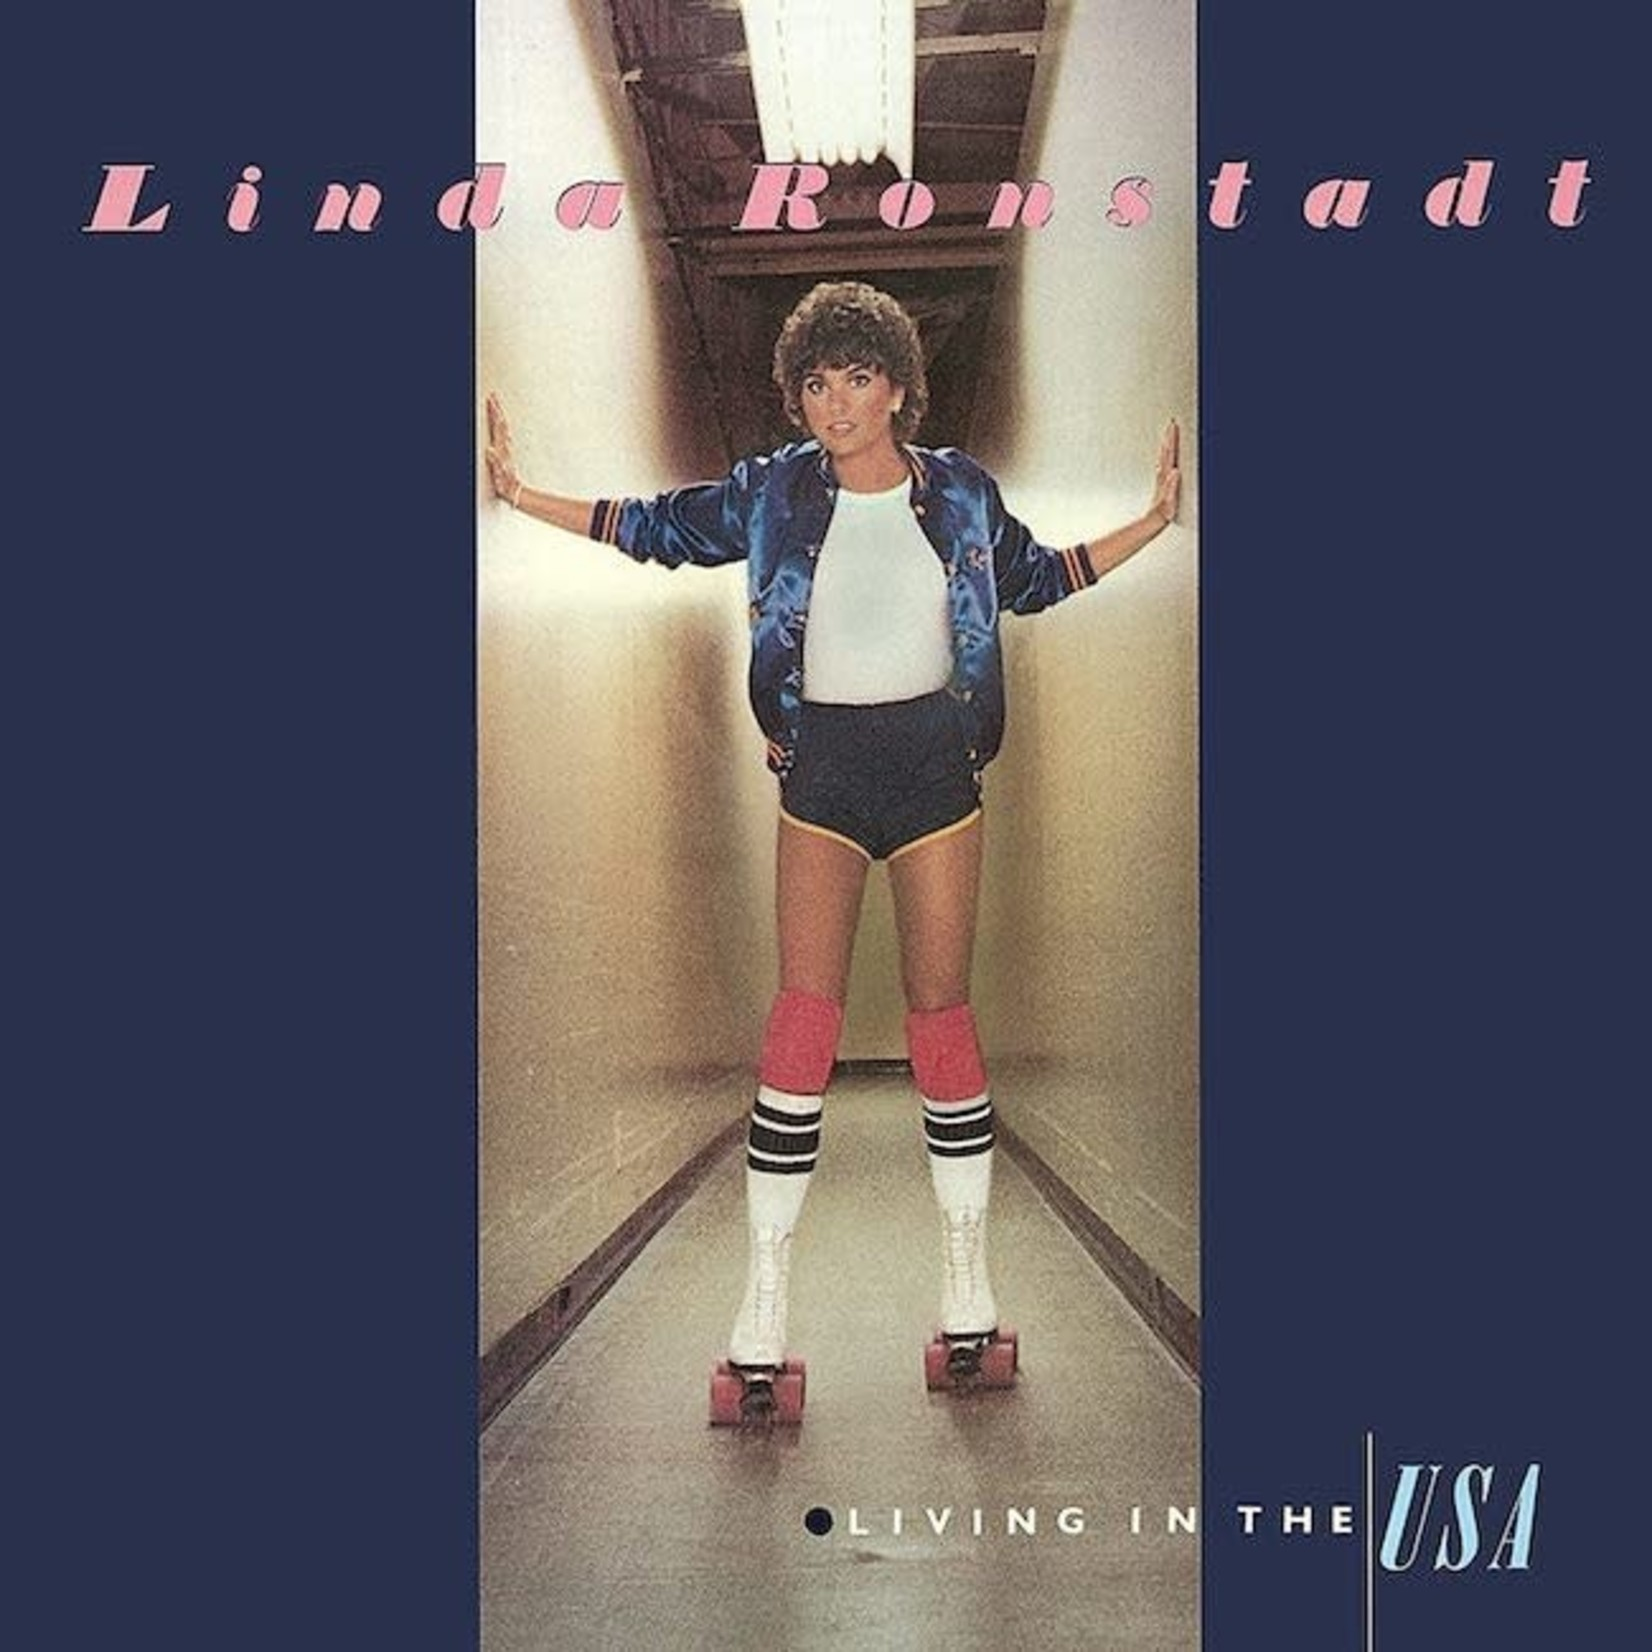 [Vintage] Ronstadt, Linda: Living in the U.S.A